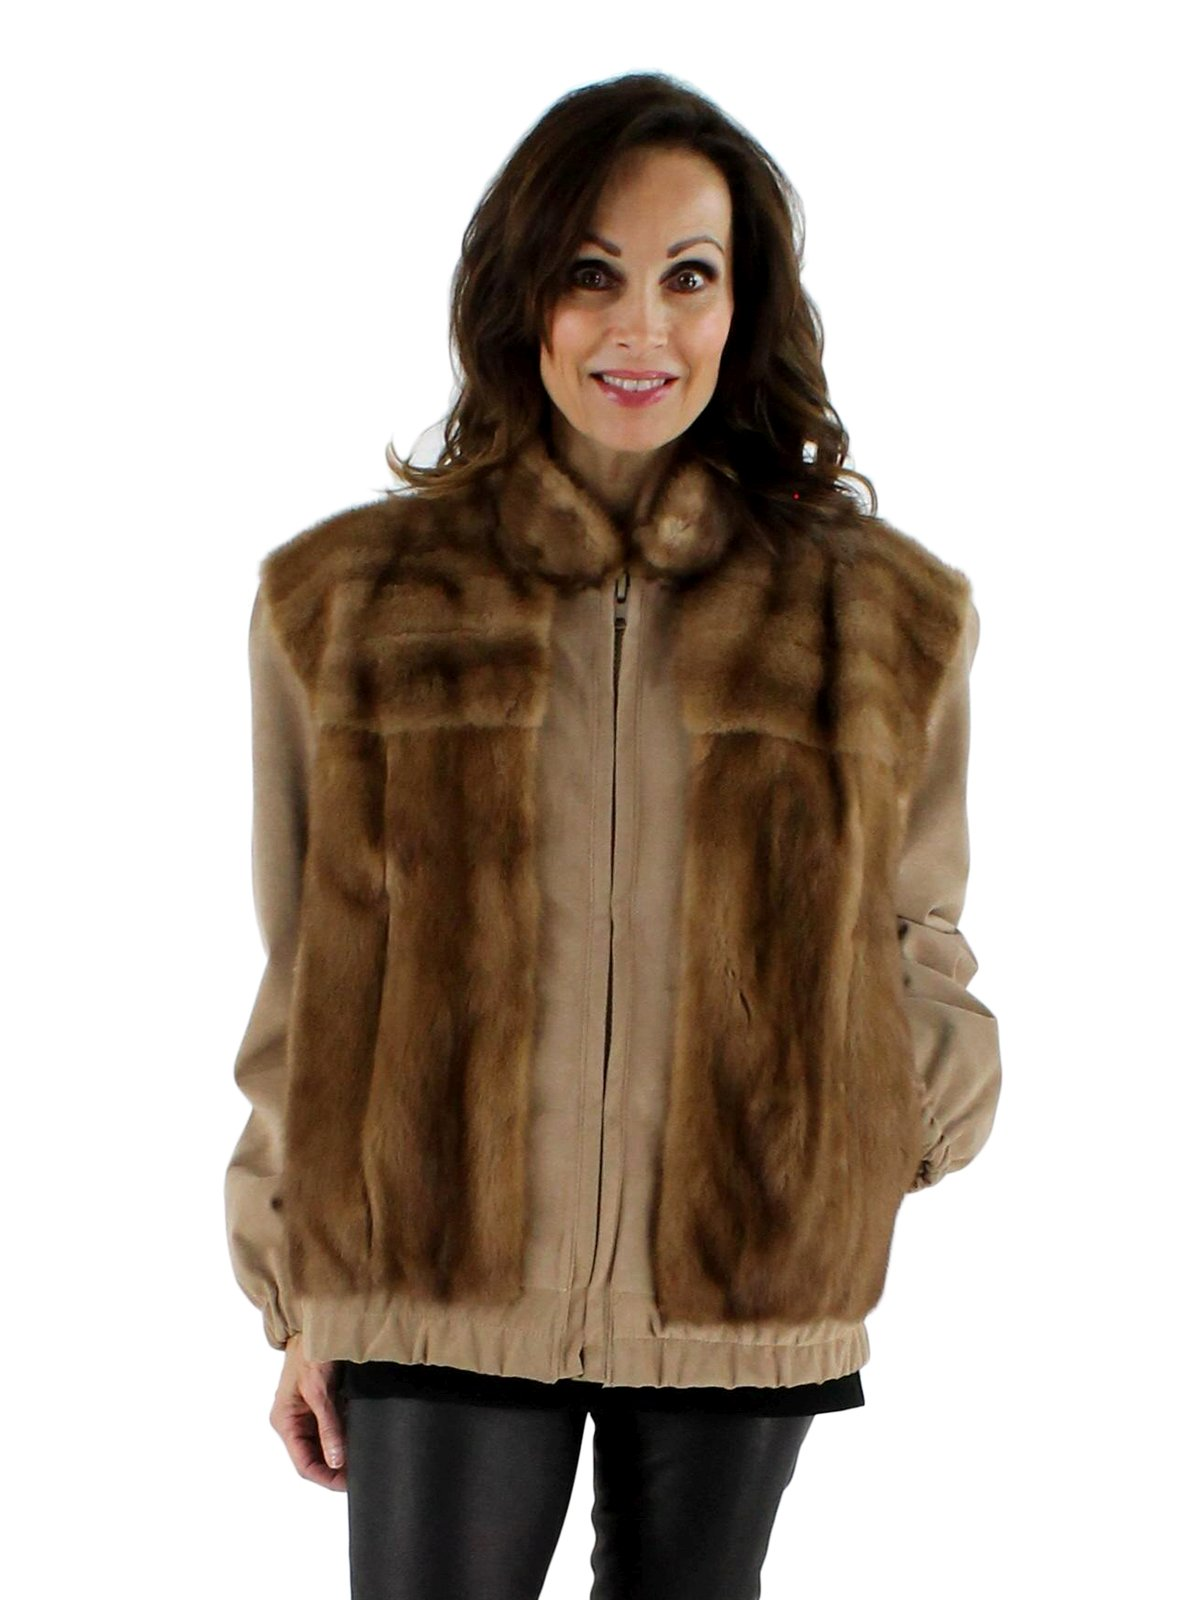 Autumn Haze Mink Jacket with Suede Sleeves